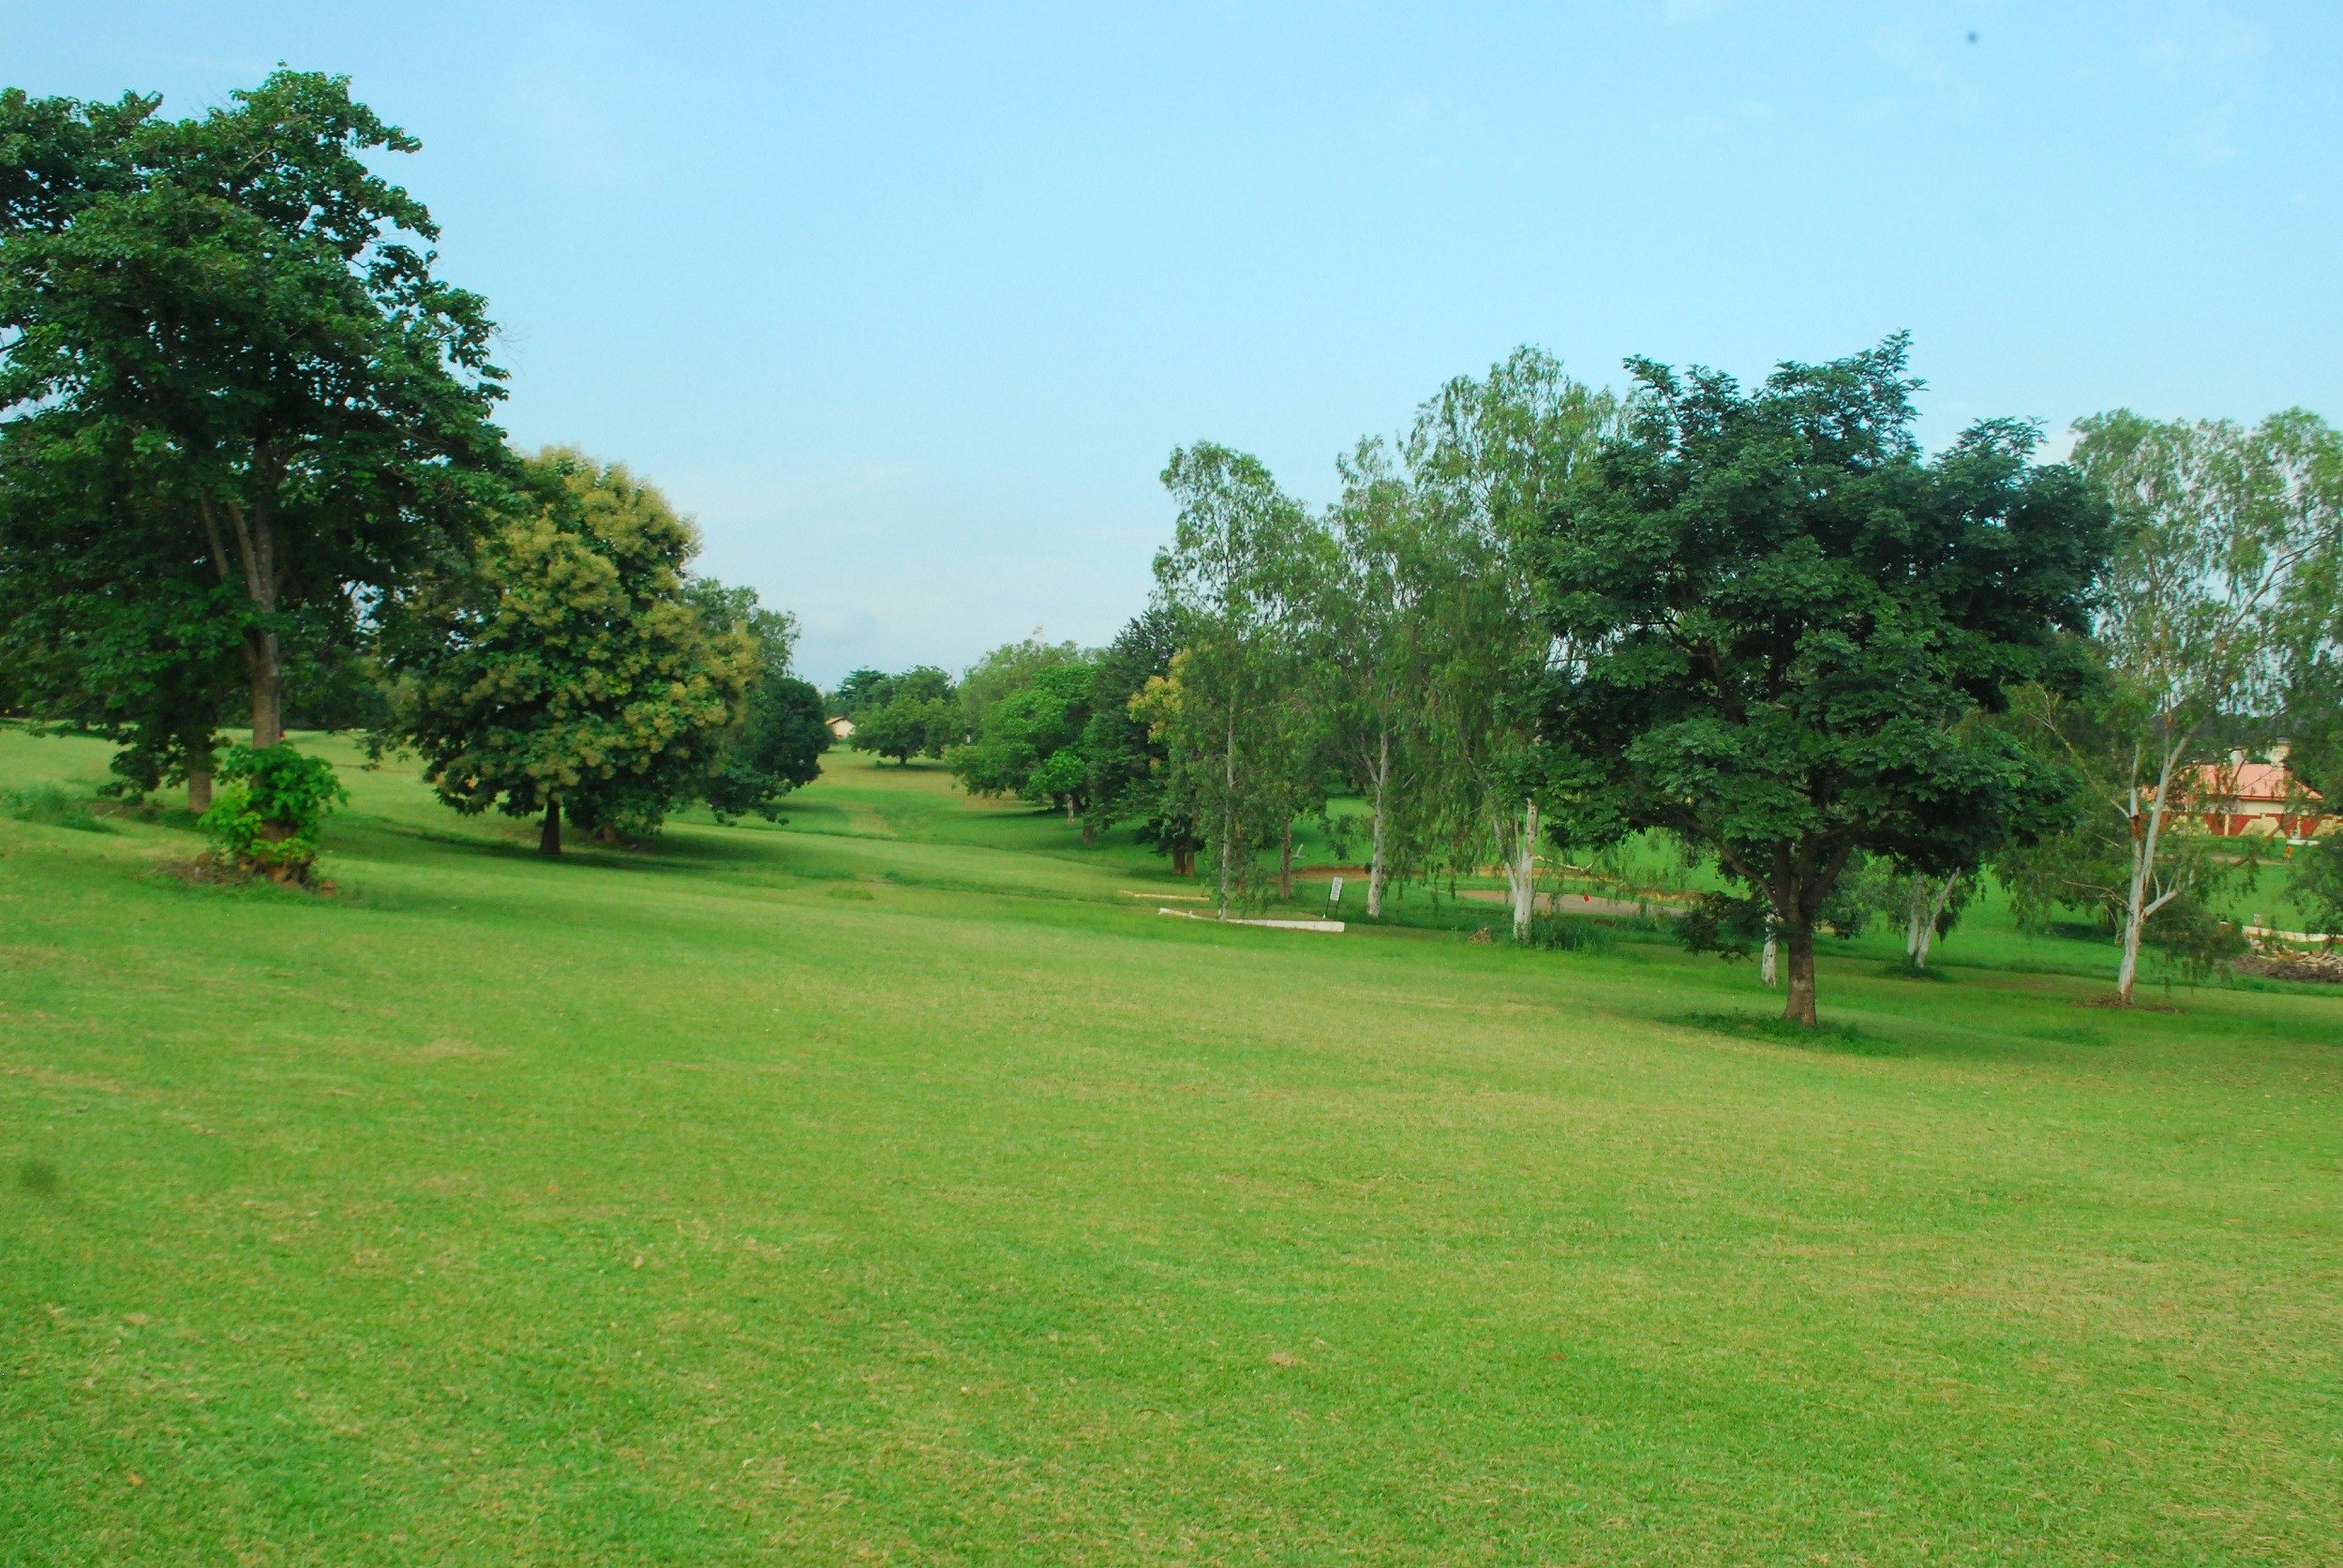 The Abakaliki Golf Course